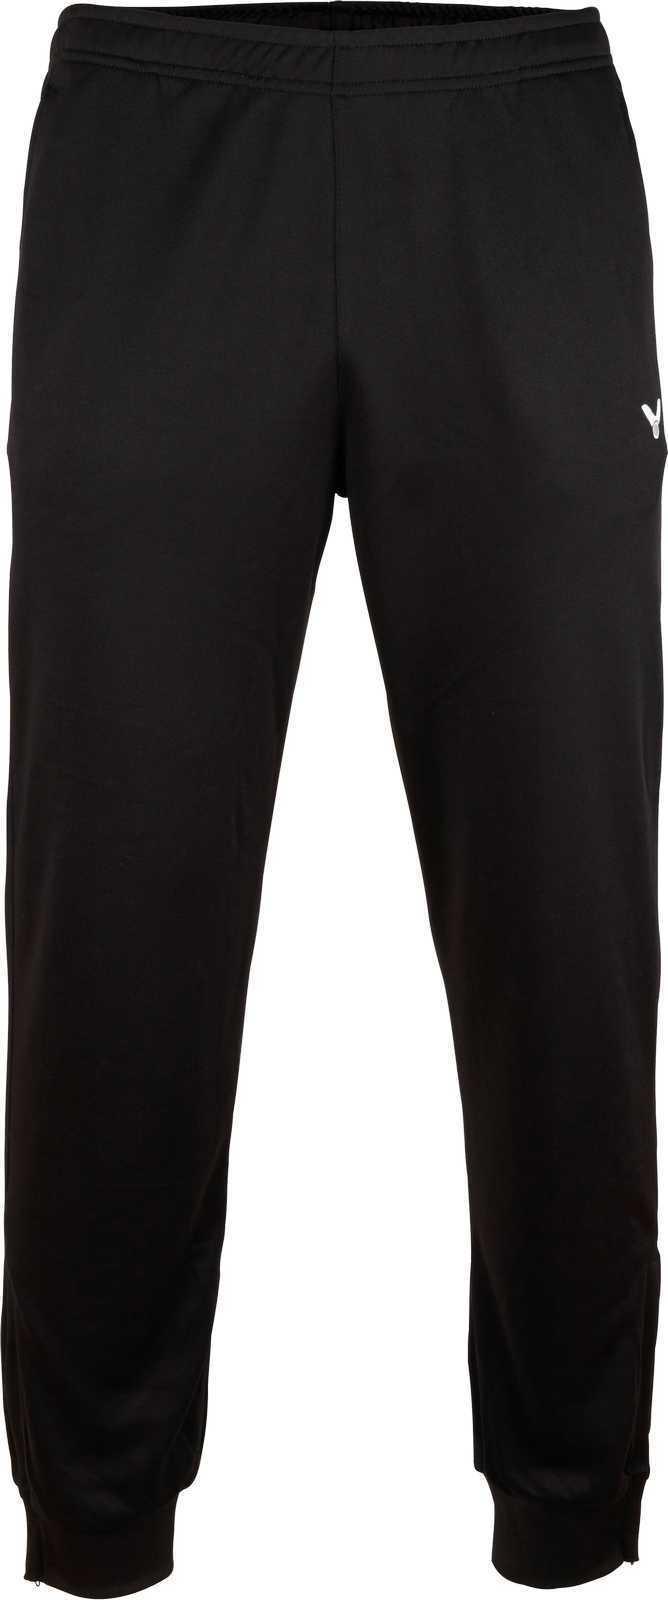 Victor TA Pants Pants Pants Team 3697    Badminton Tischtennis Anzug  | Einzigartig  9f689e